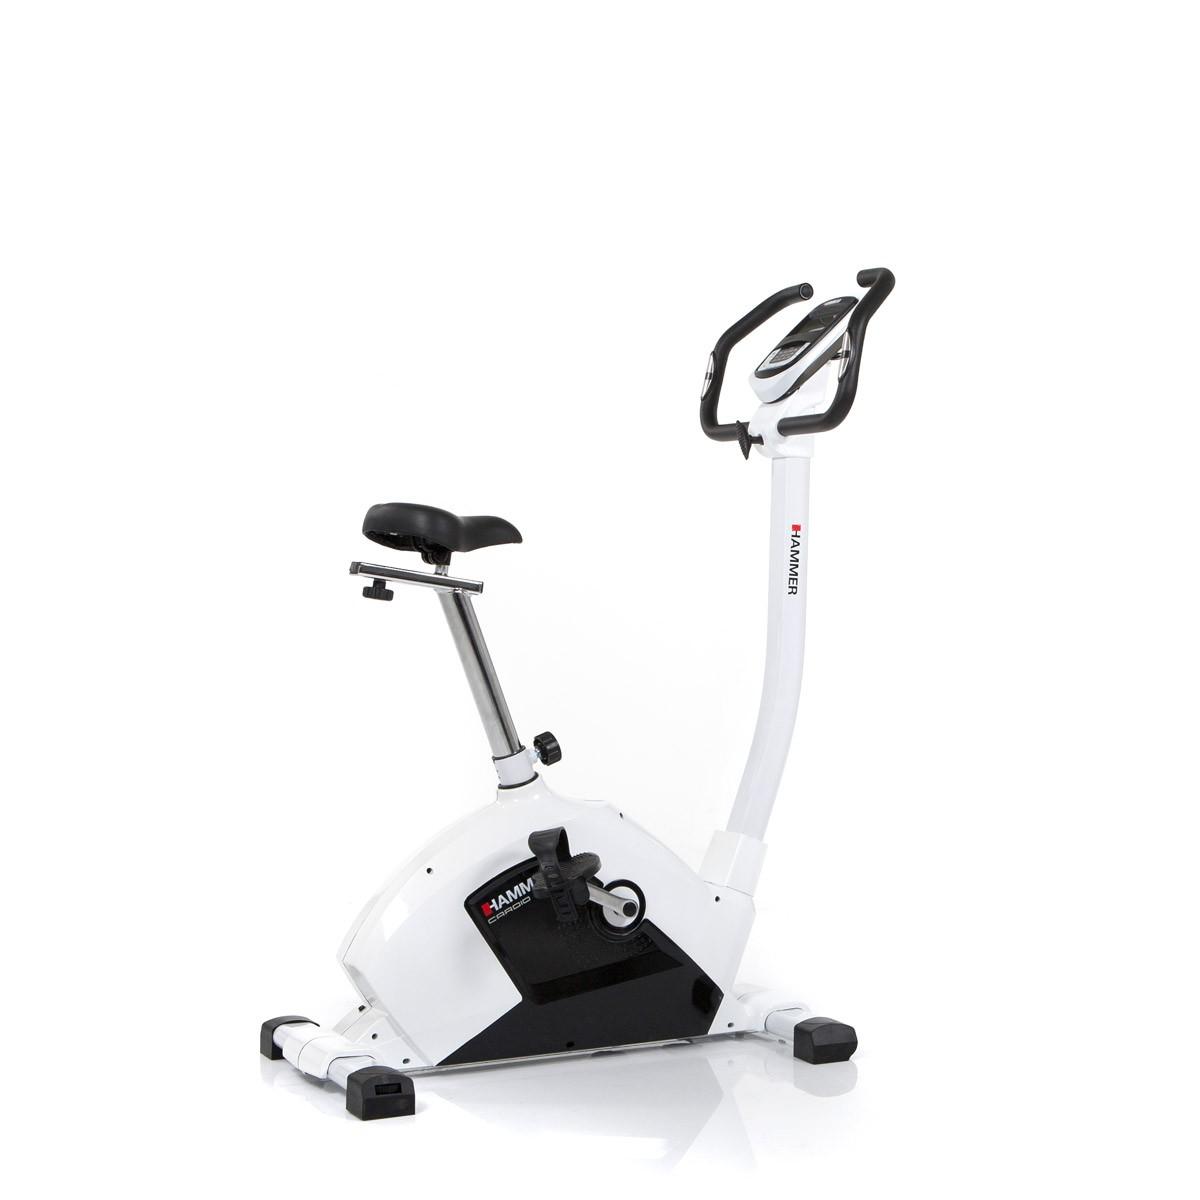 hammer exercise bike cardio xt5Hammer Cardio Xtr Ergometer #7